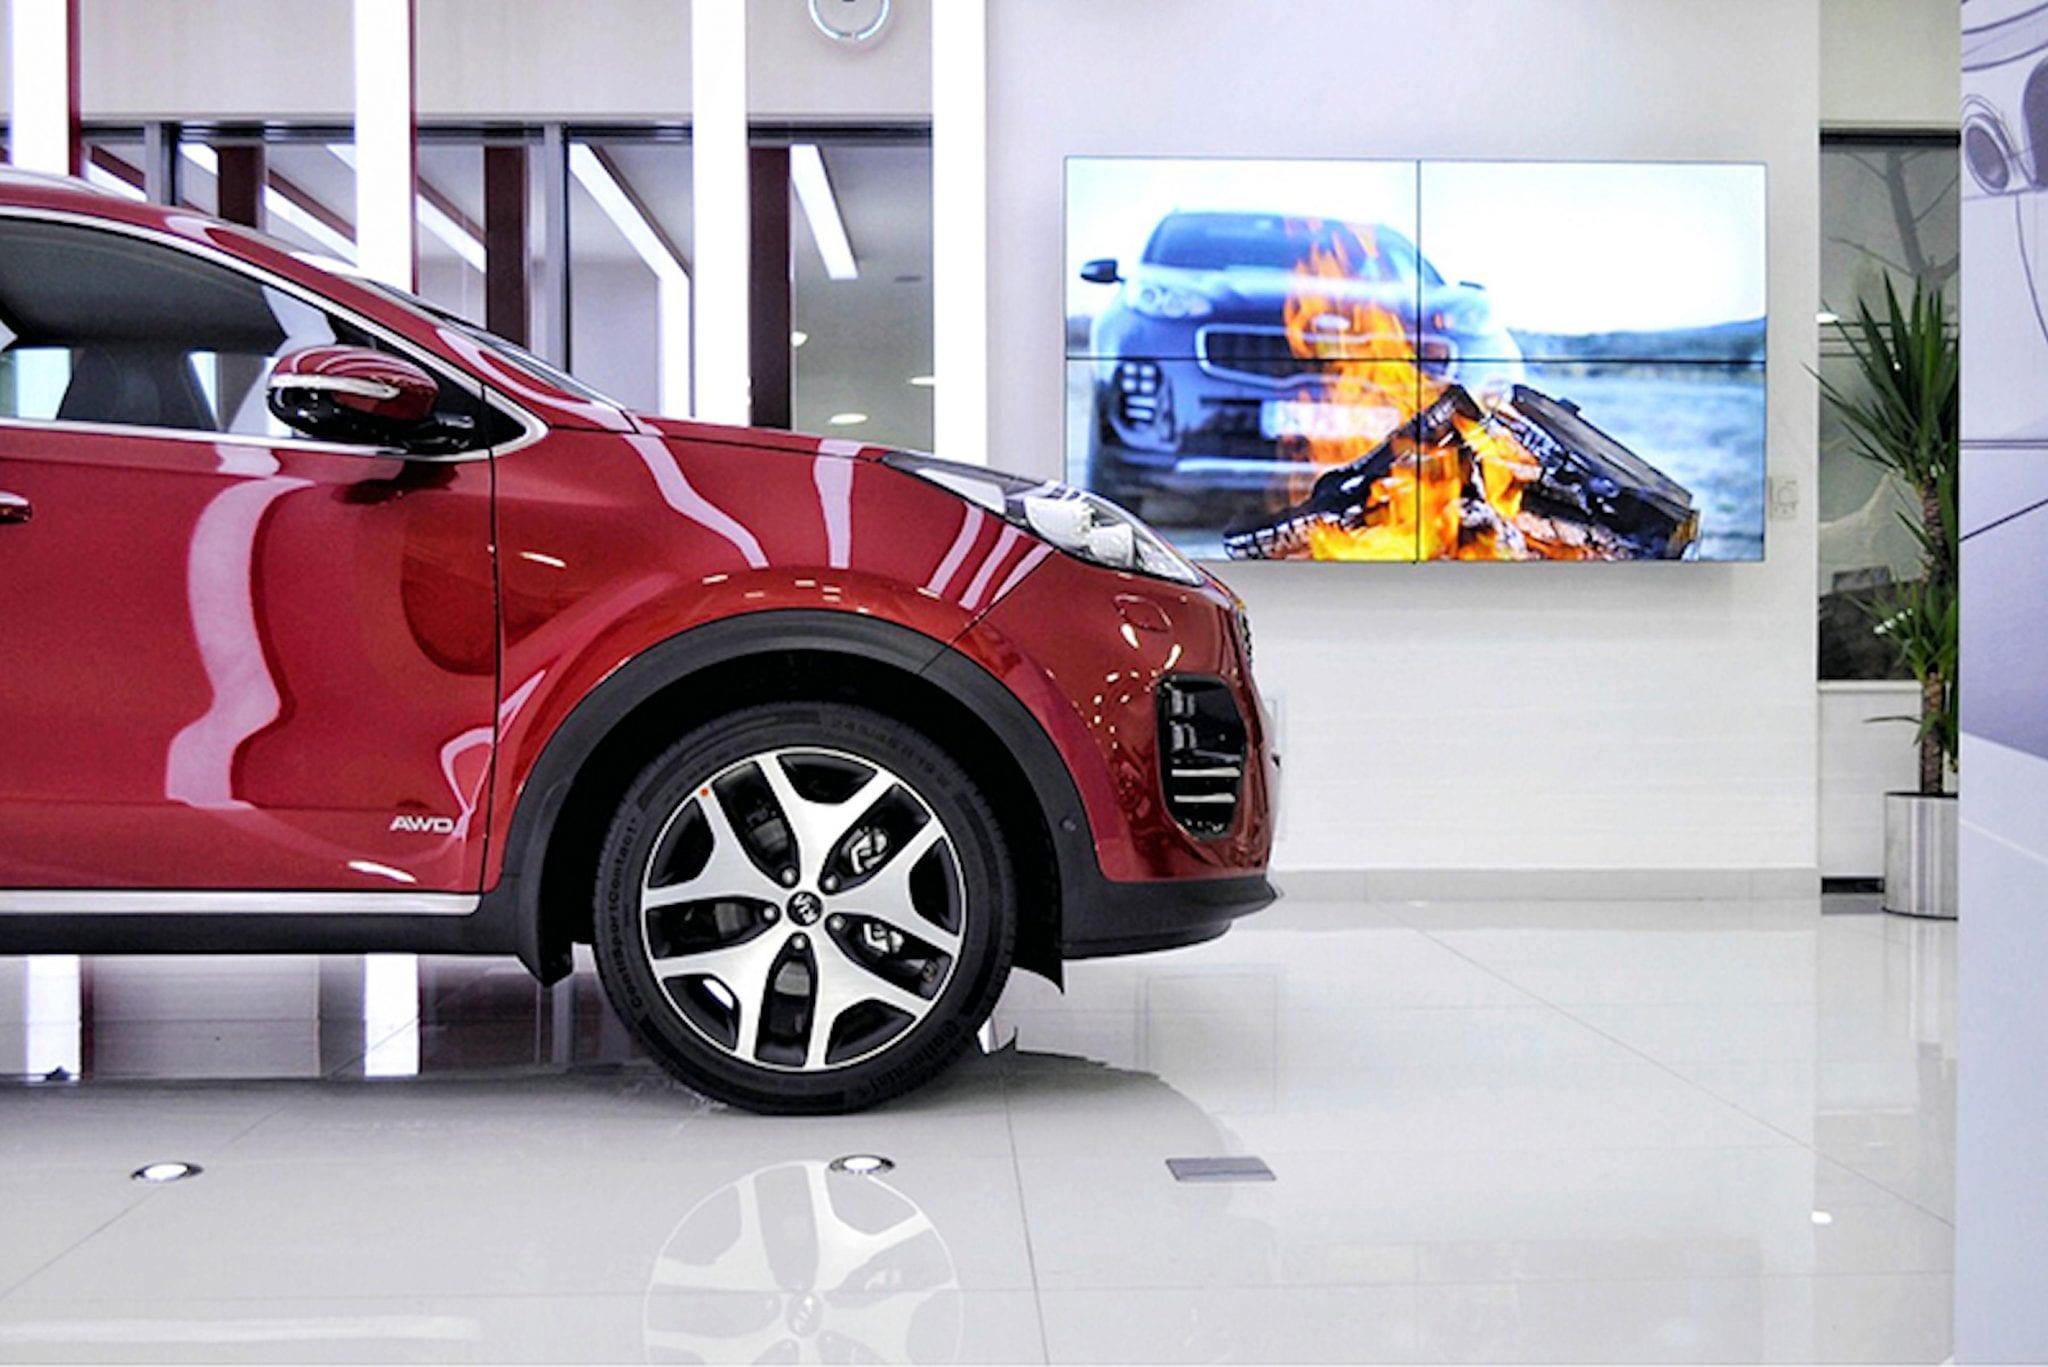 Zytronic touch technology in Kia car dealership